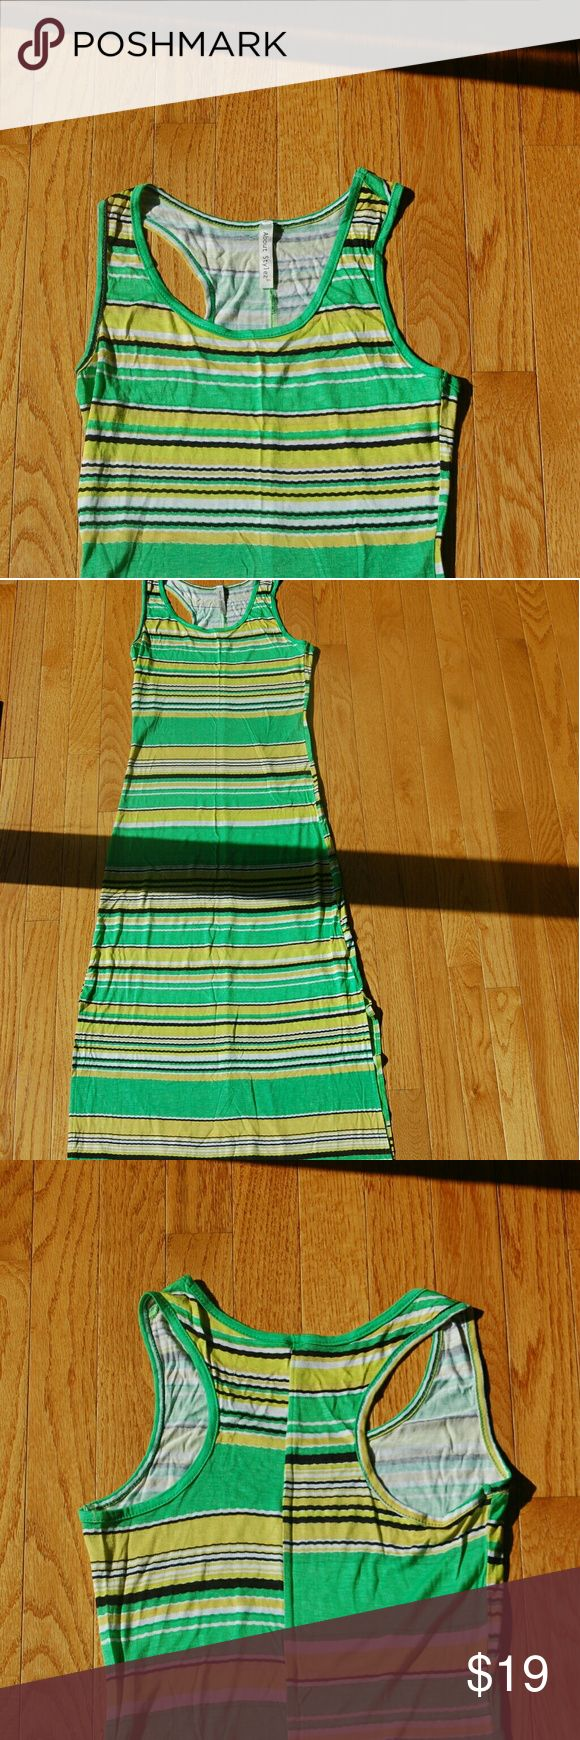 Lime Green Maxi Dress New Green Stripe Maxi Dress w Two Slits  Razor Back Style Dresses Maxi